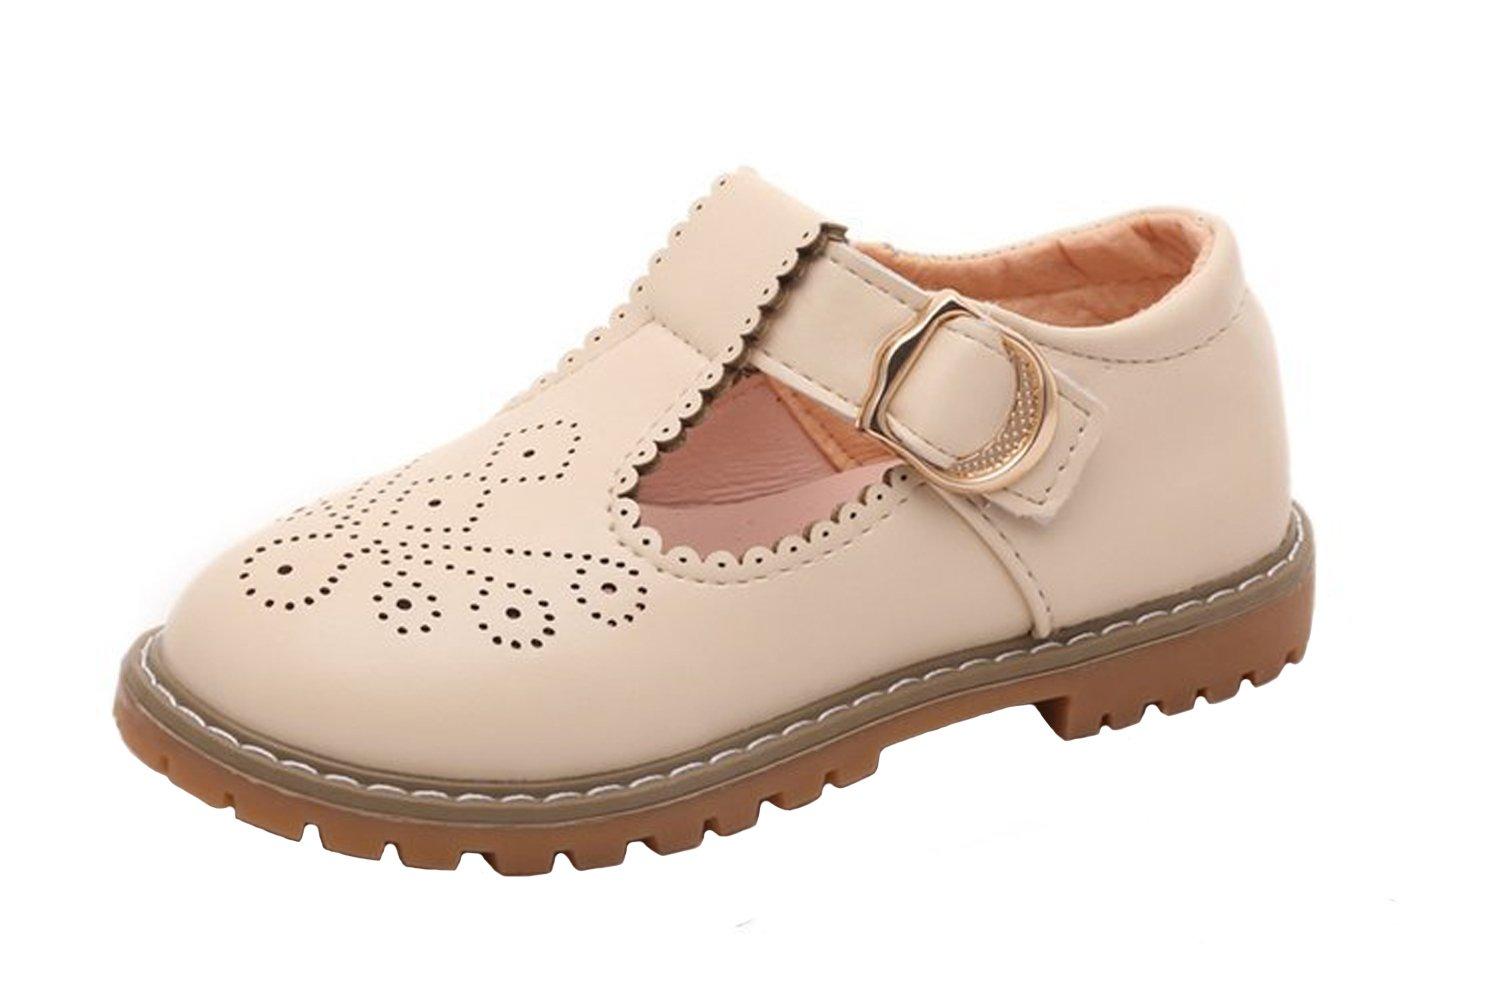 WUIWUIYU Toddlers Little Big Girls T-Strap Oxfords Shoes School Uniform Dress Mary Jane Flats